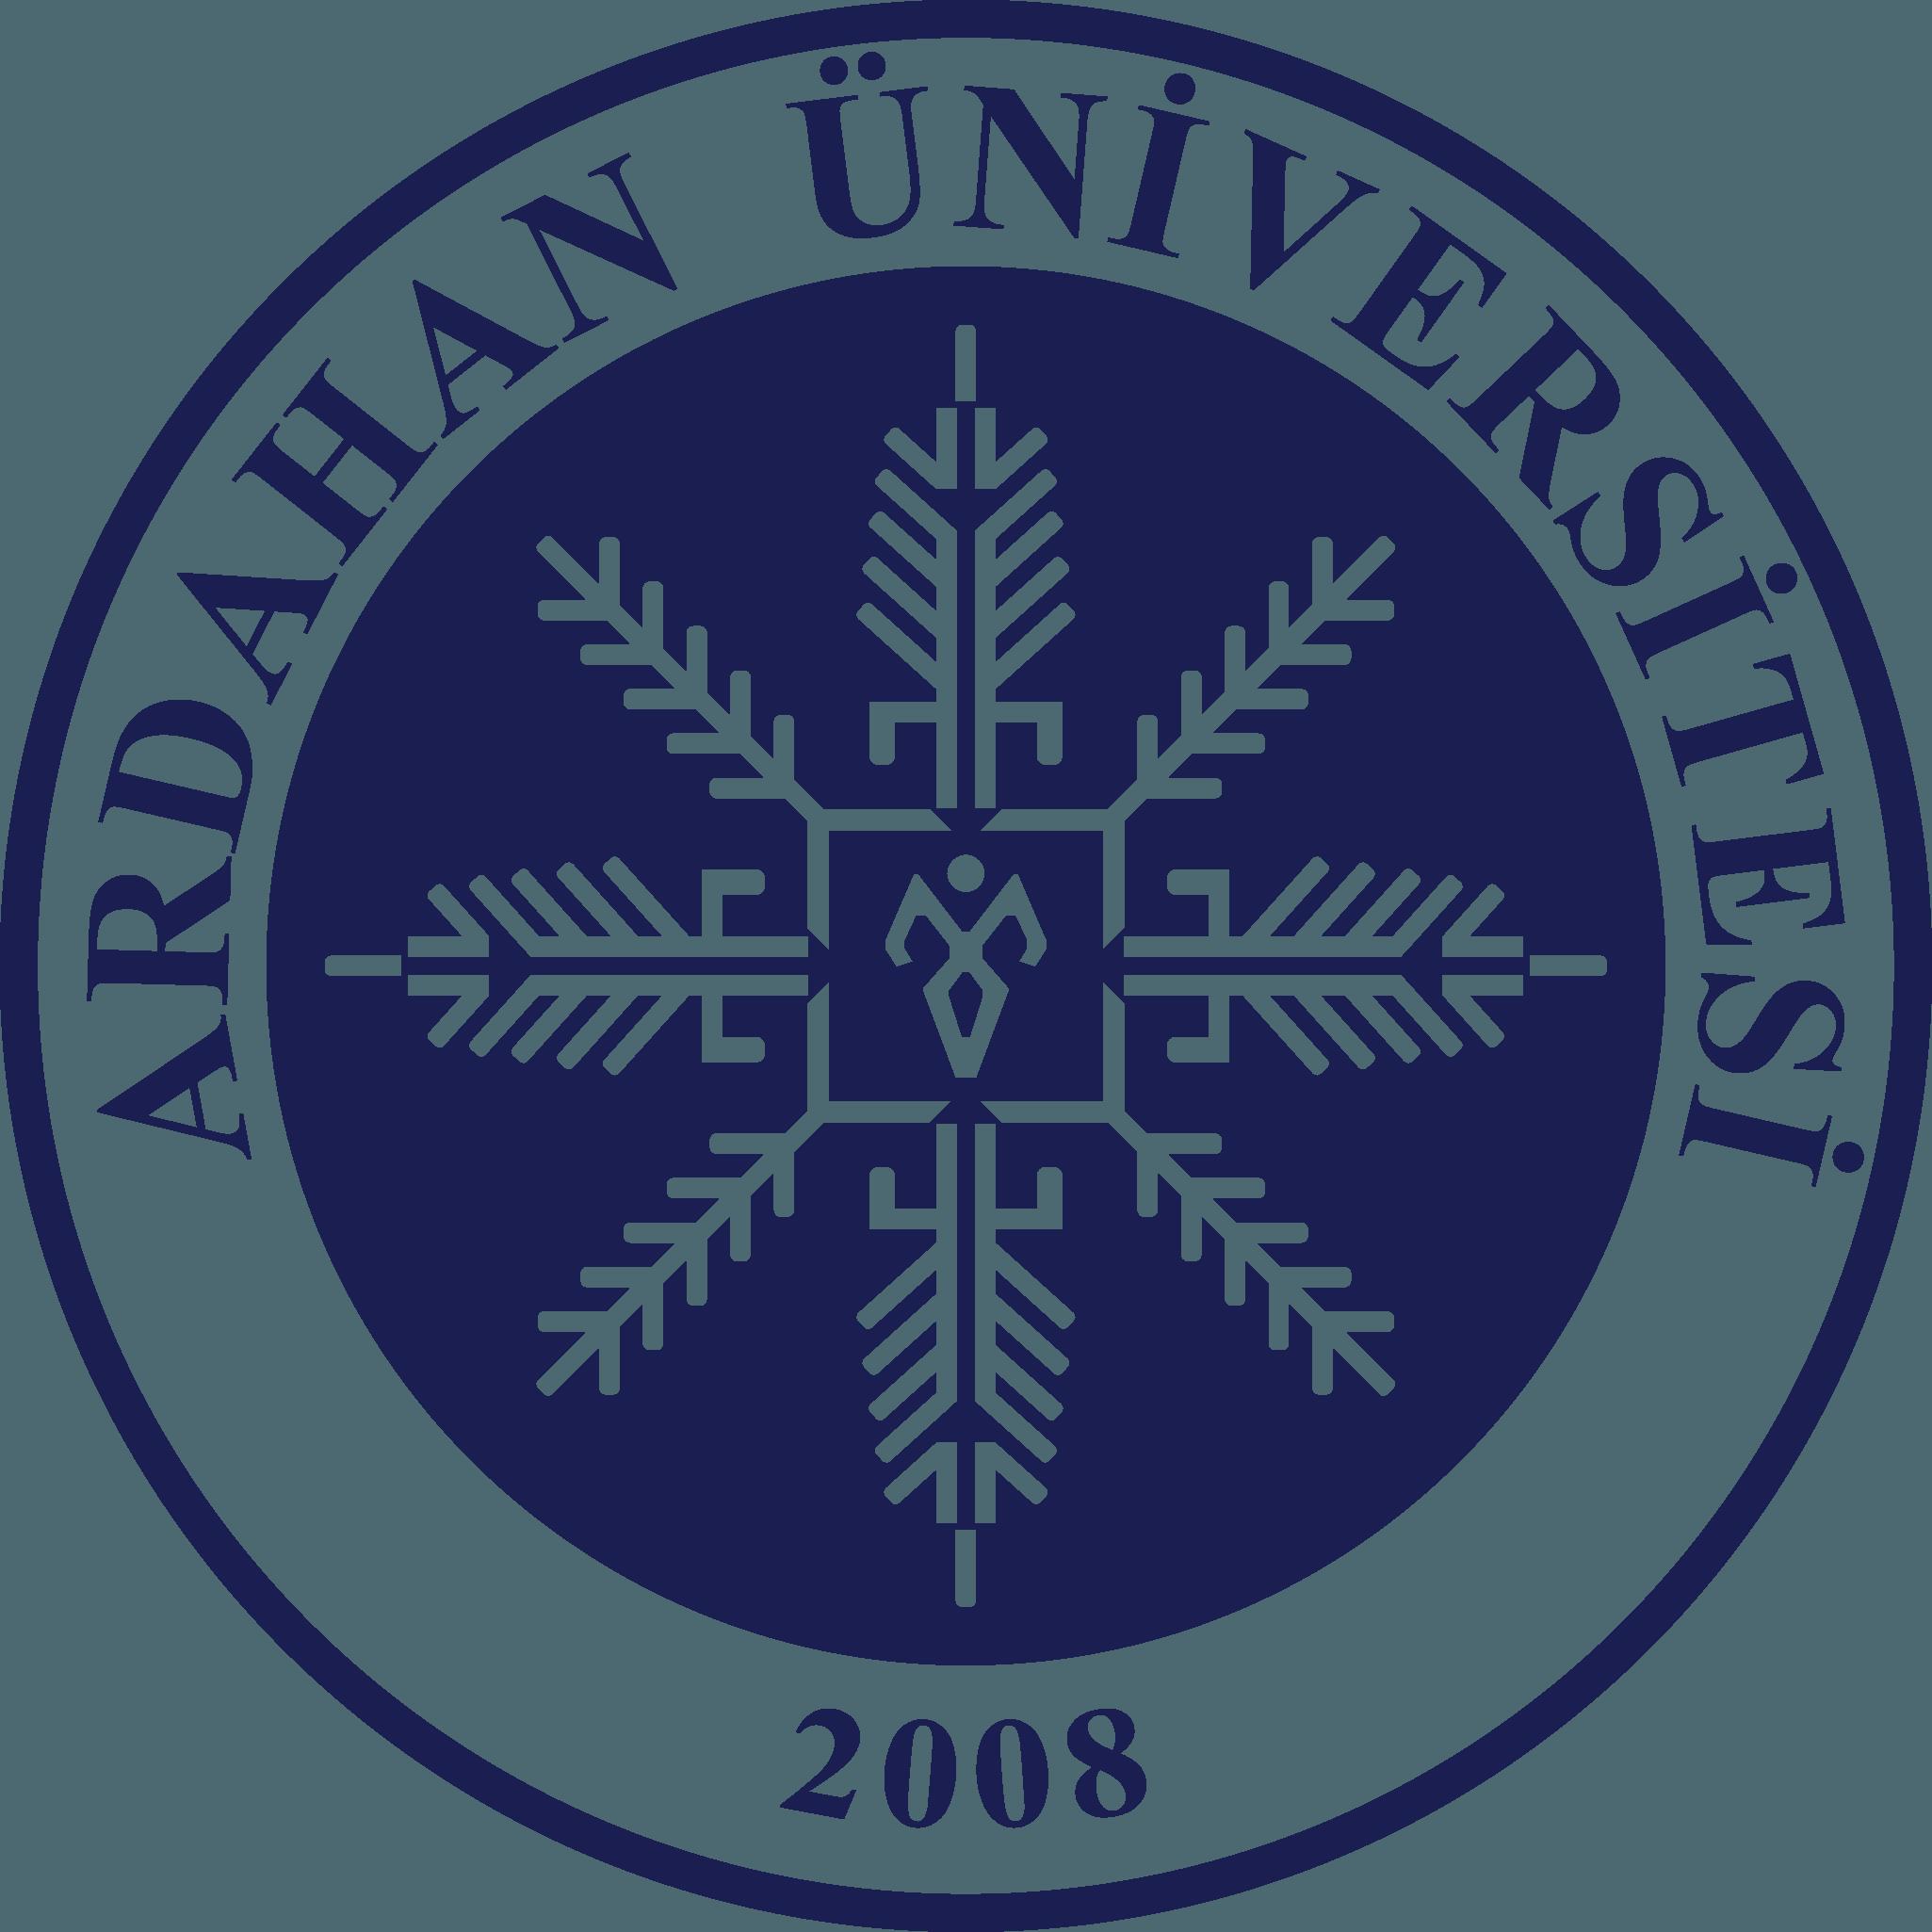 Ardahan Üniversitesi Logo   Amblem